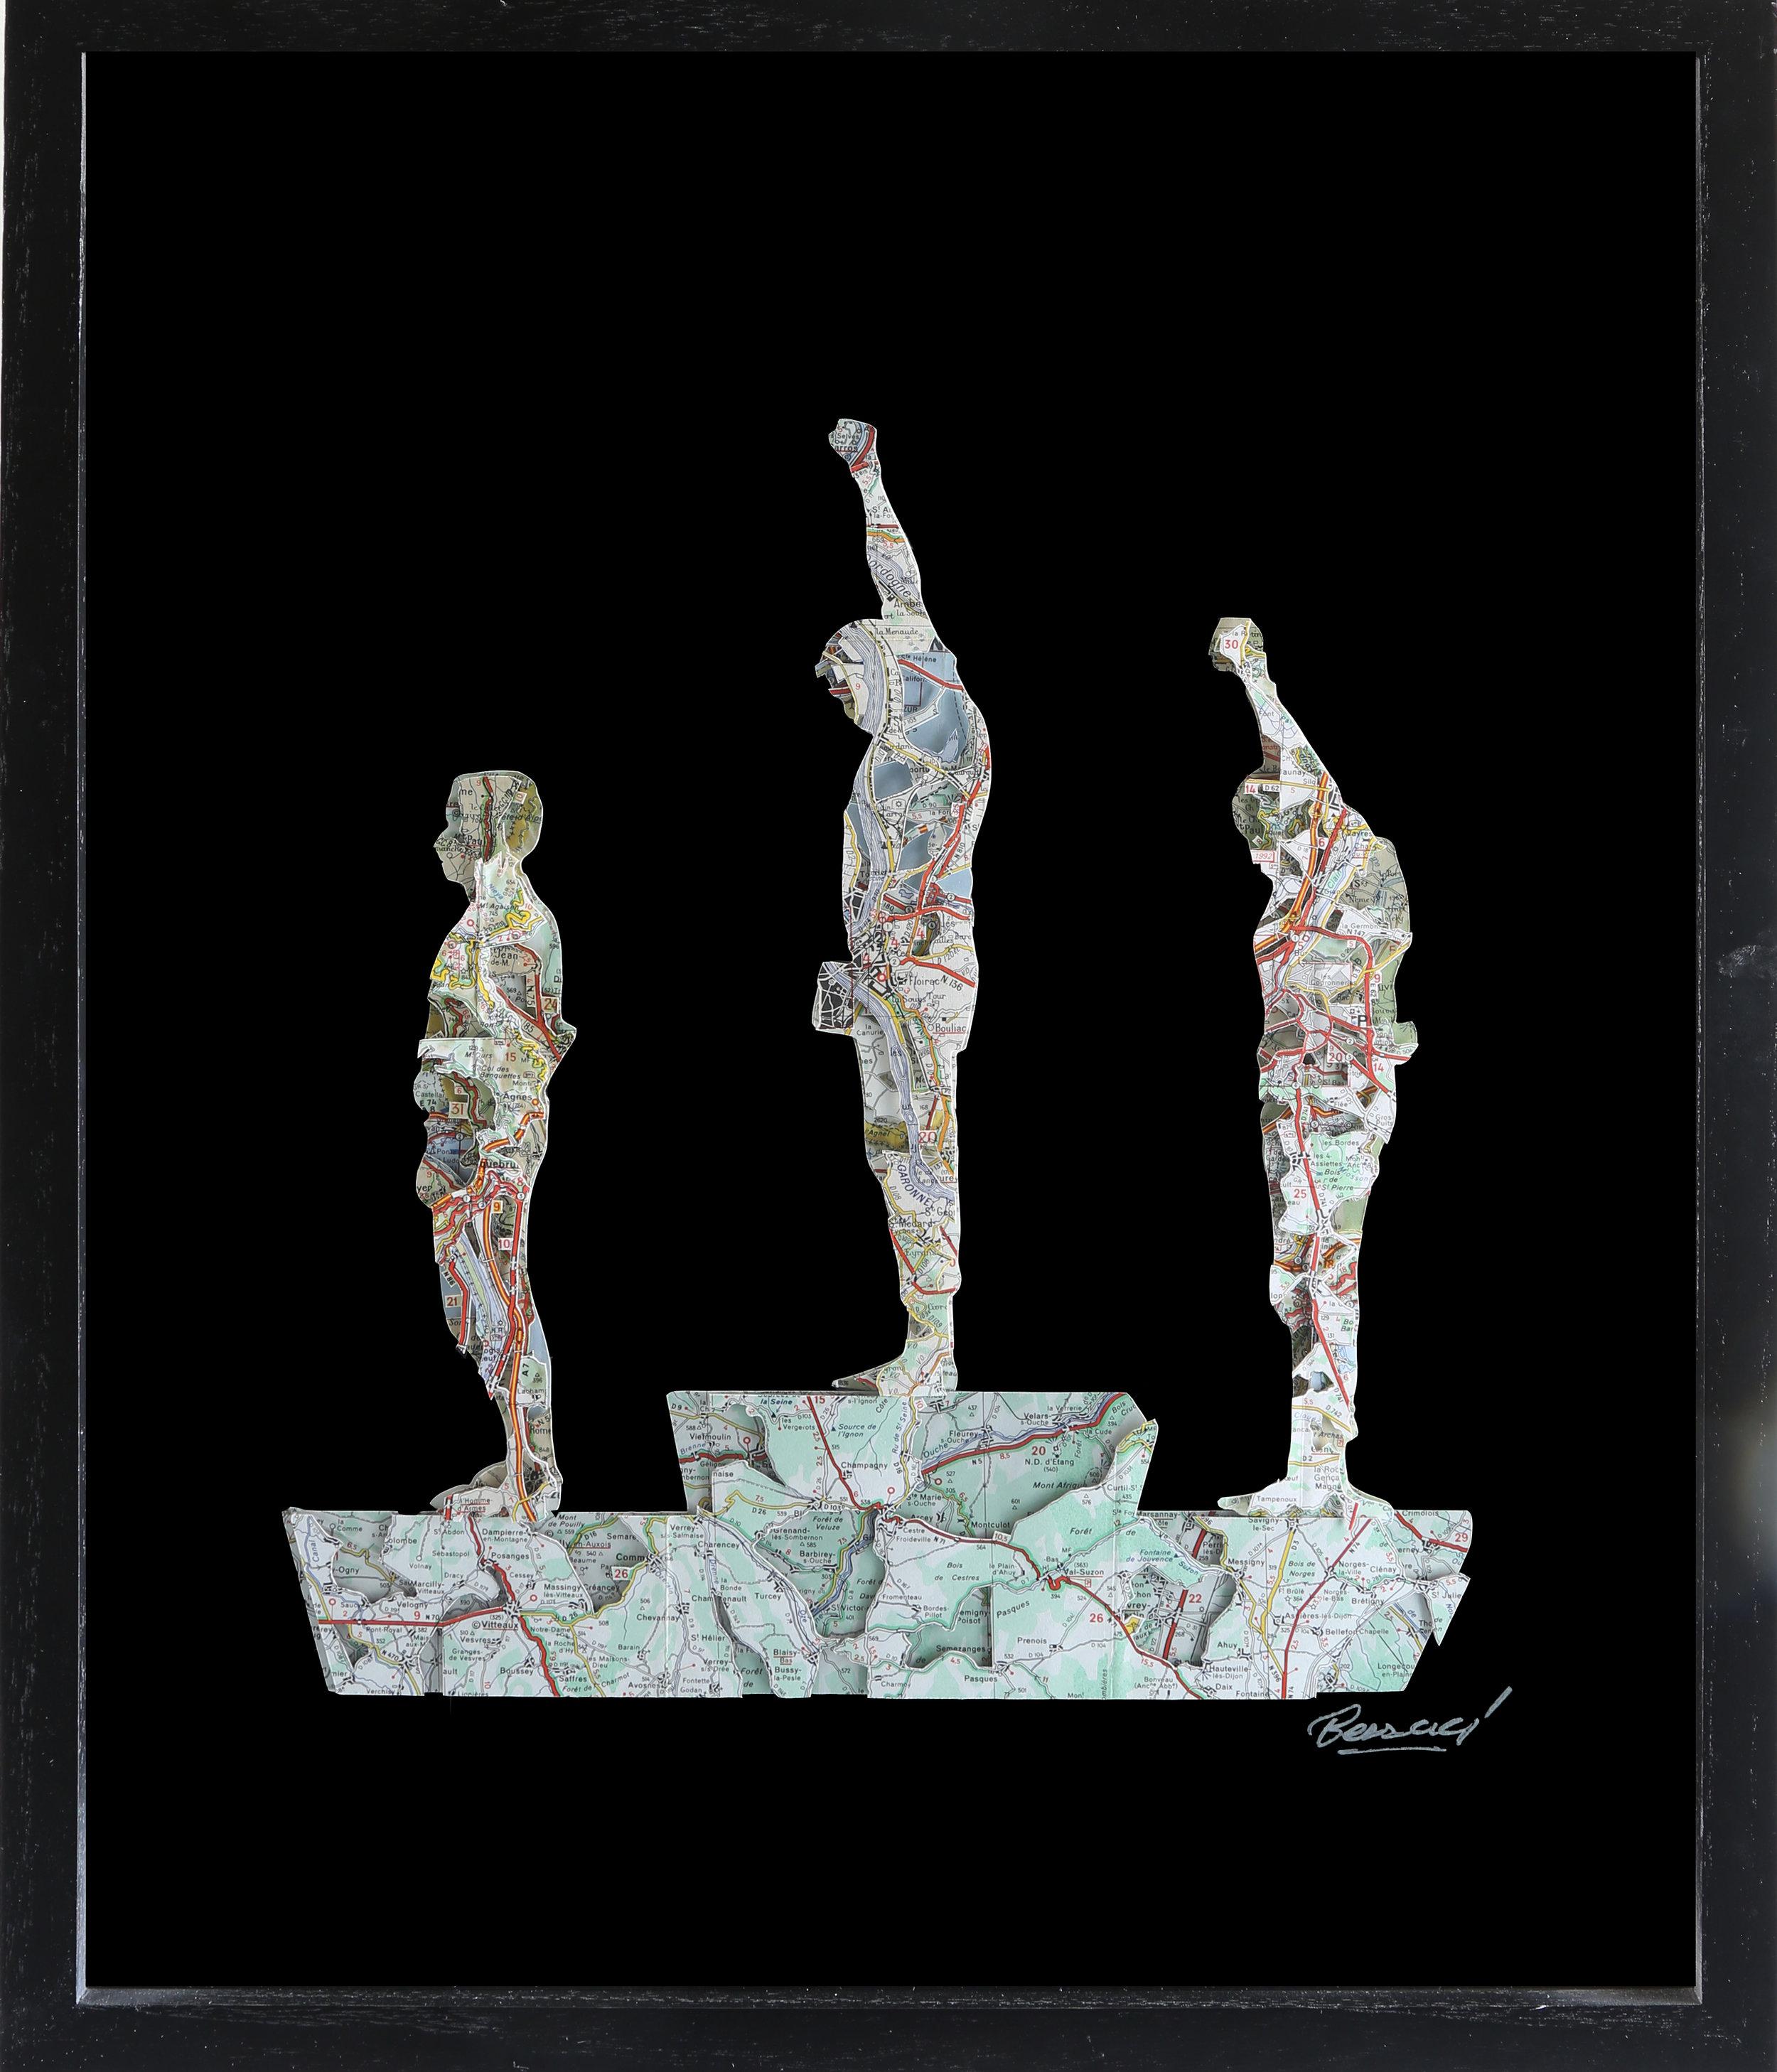 GalleryOonH-Joanathan Bessaci-Black Power Olympians-2017-Michelin maps and glass-16x20-1400.JPG